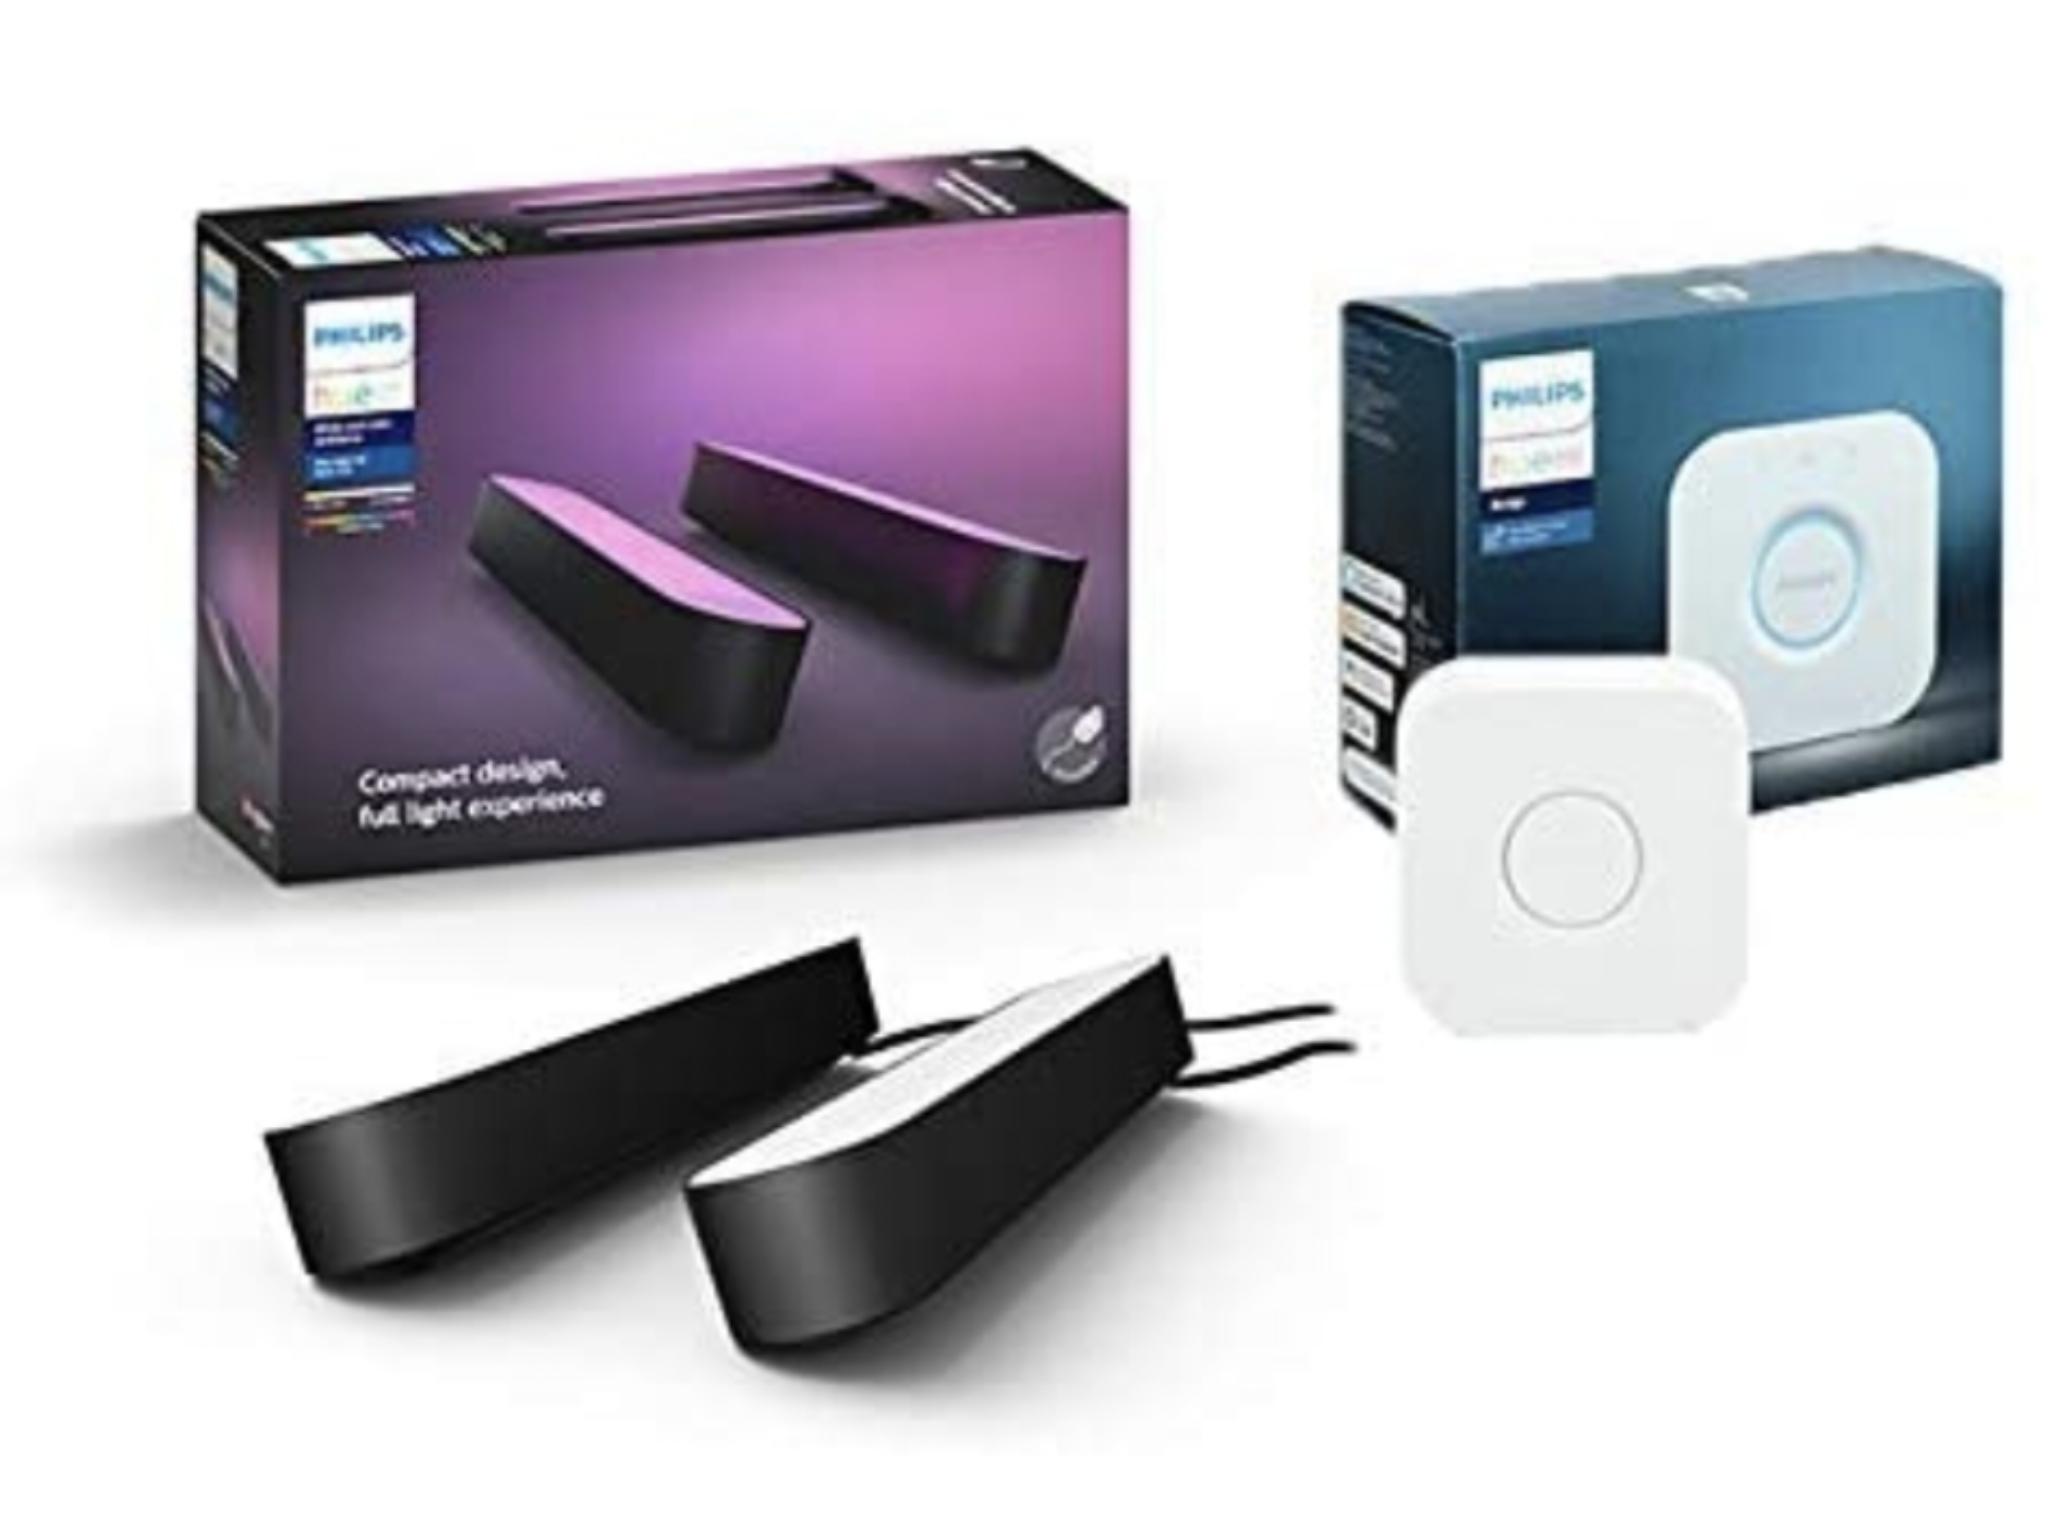 Philips Hue Smart Light Bar Double Pack with Hue Bridge - £99.99 Amazon Prime Exclusive